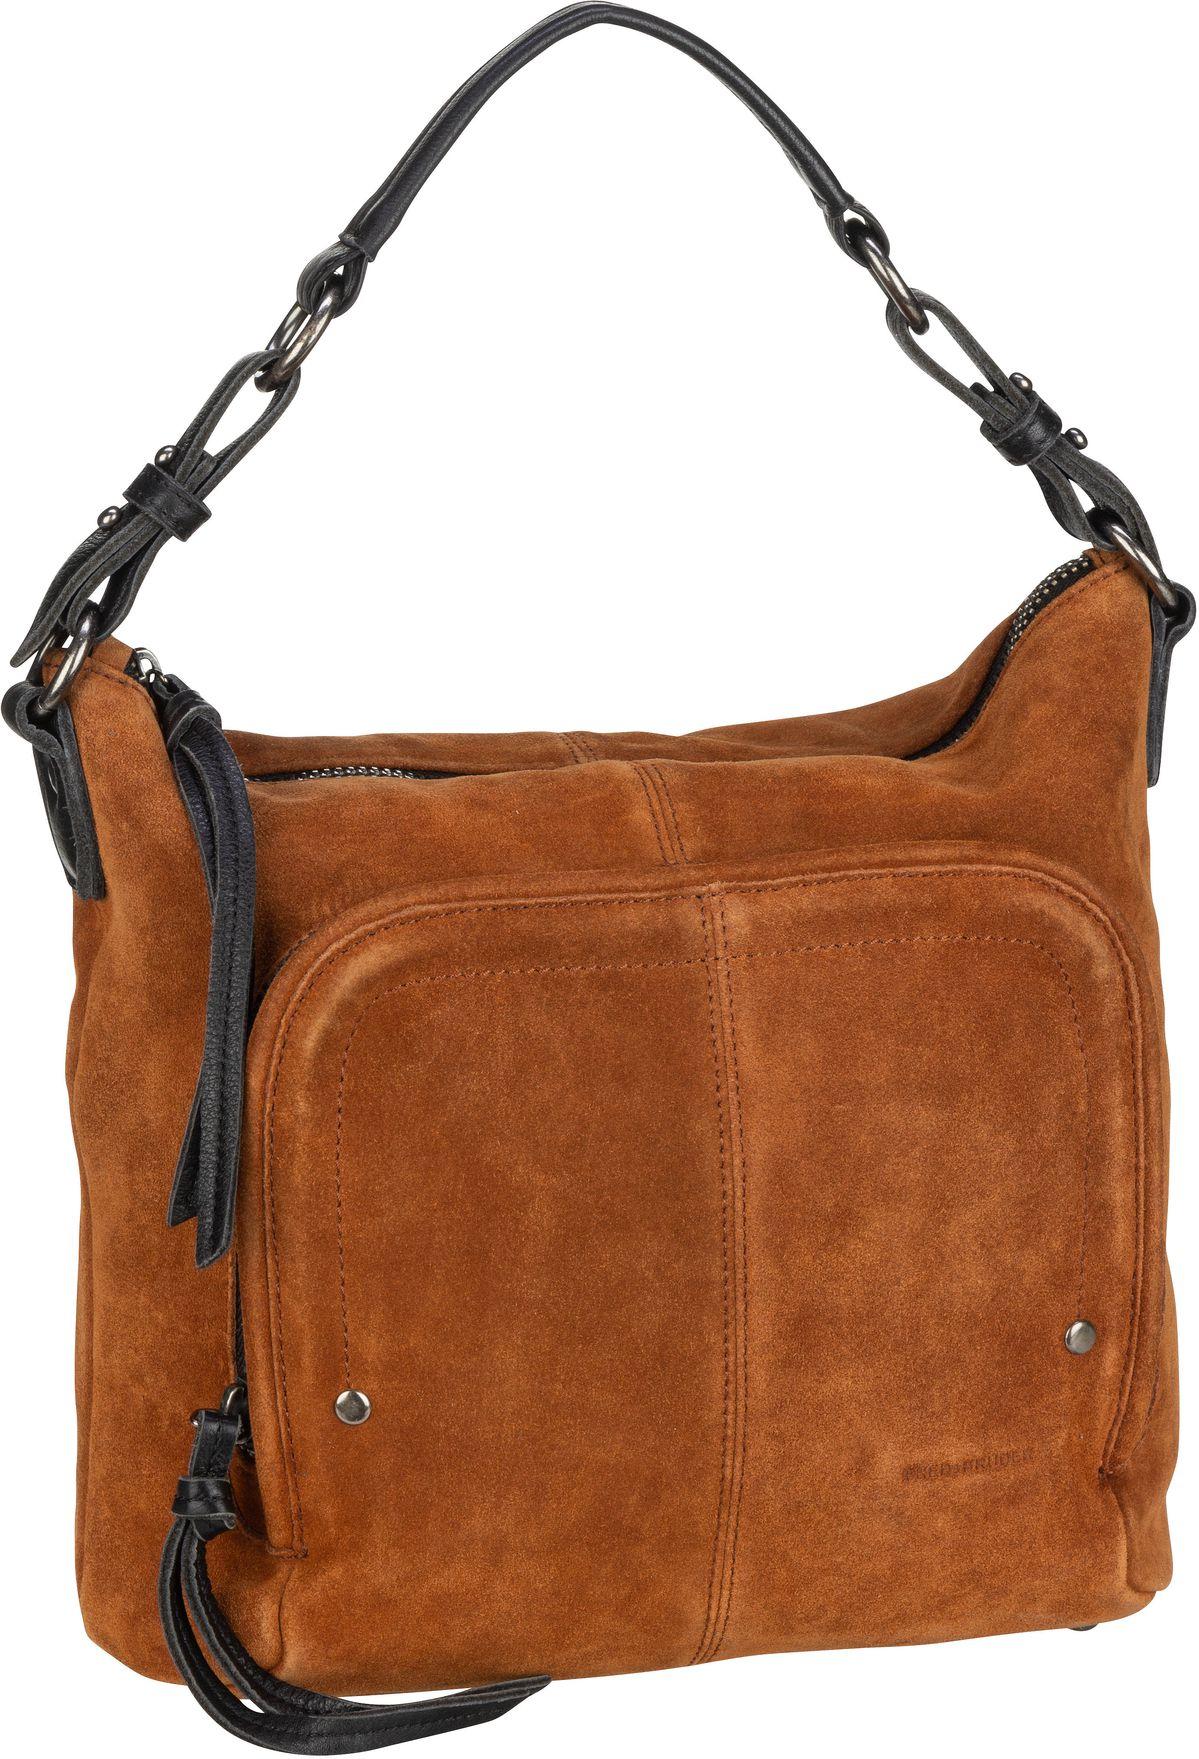 Handtasche Peaty Caramel